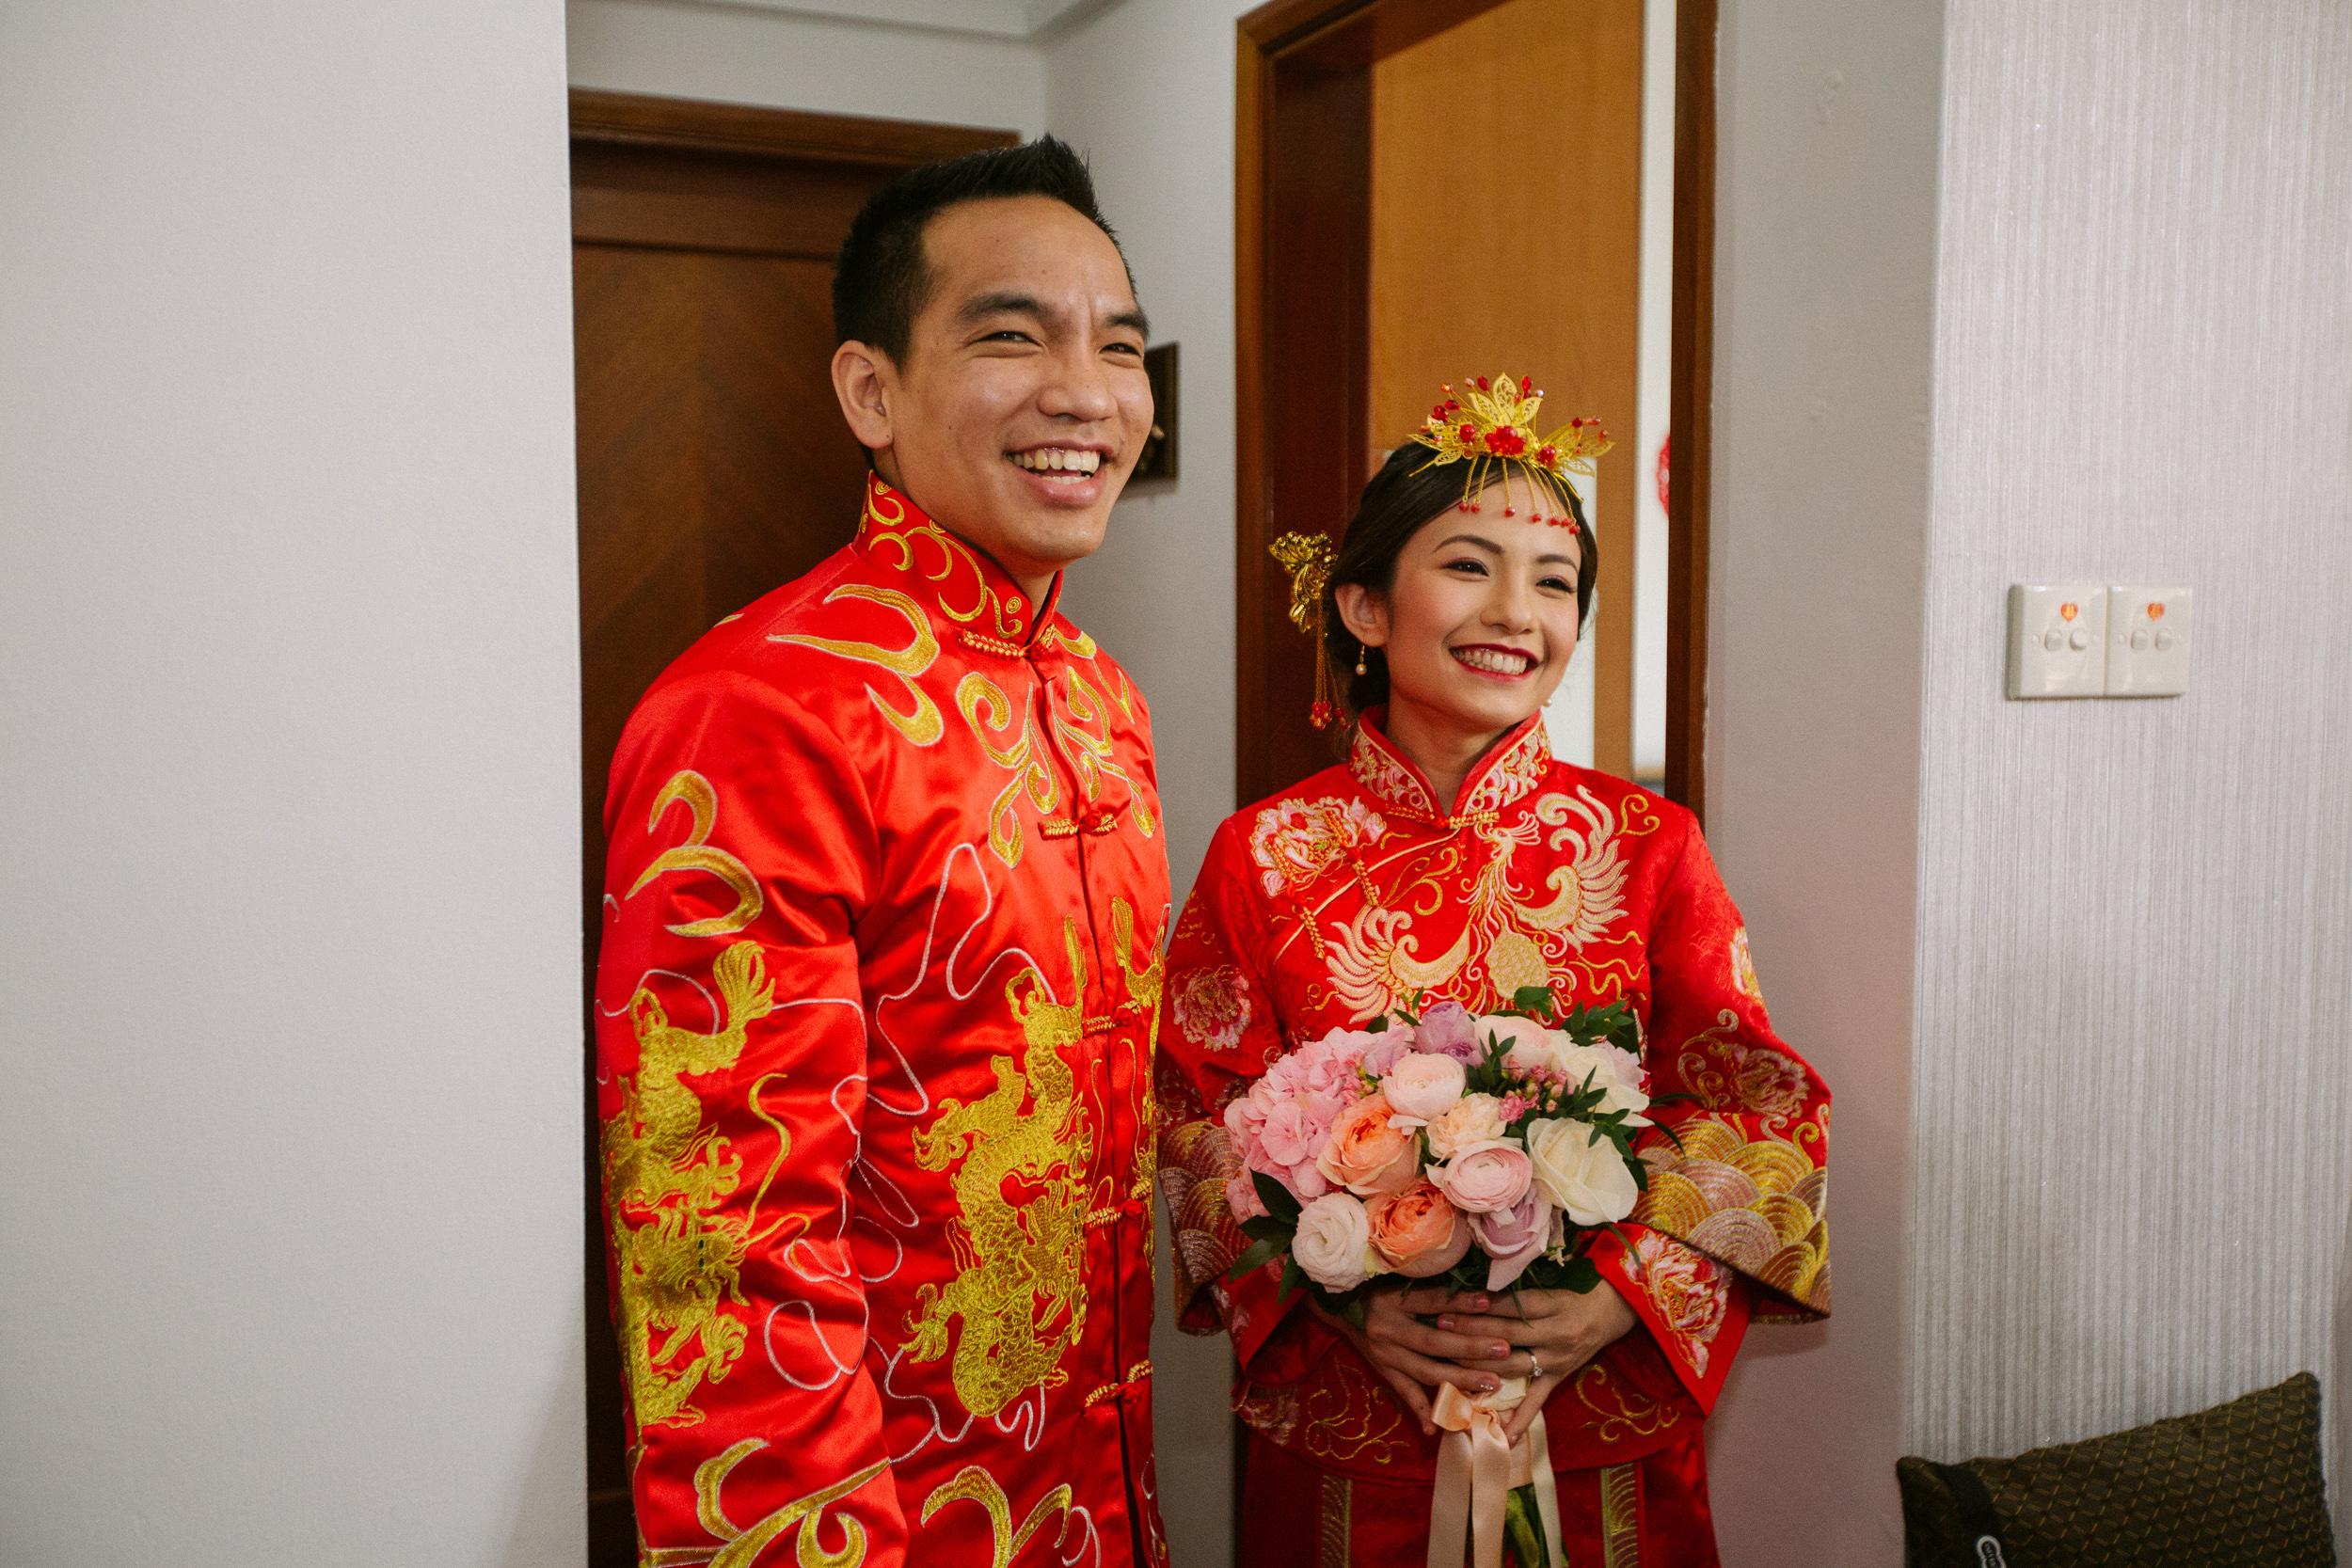 singapore-wedding-photographer-cheryl-matthew-fullerton-hotel-wedding-26.jpg